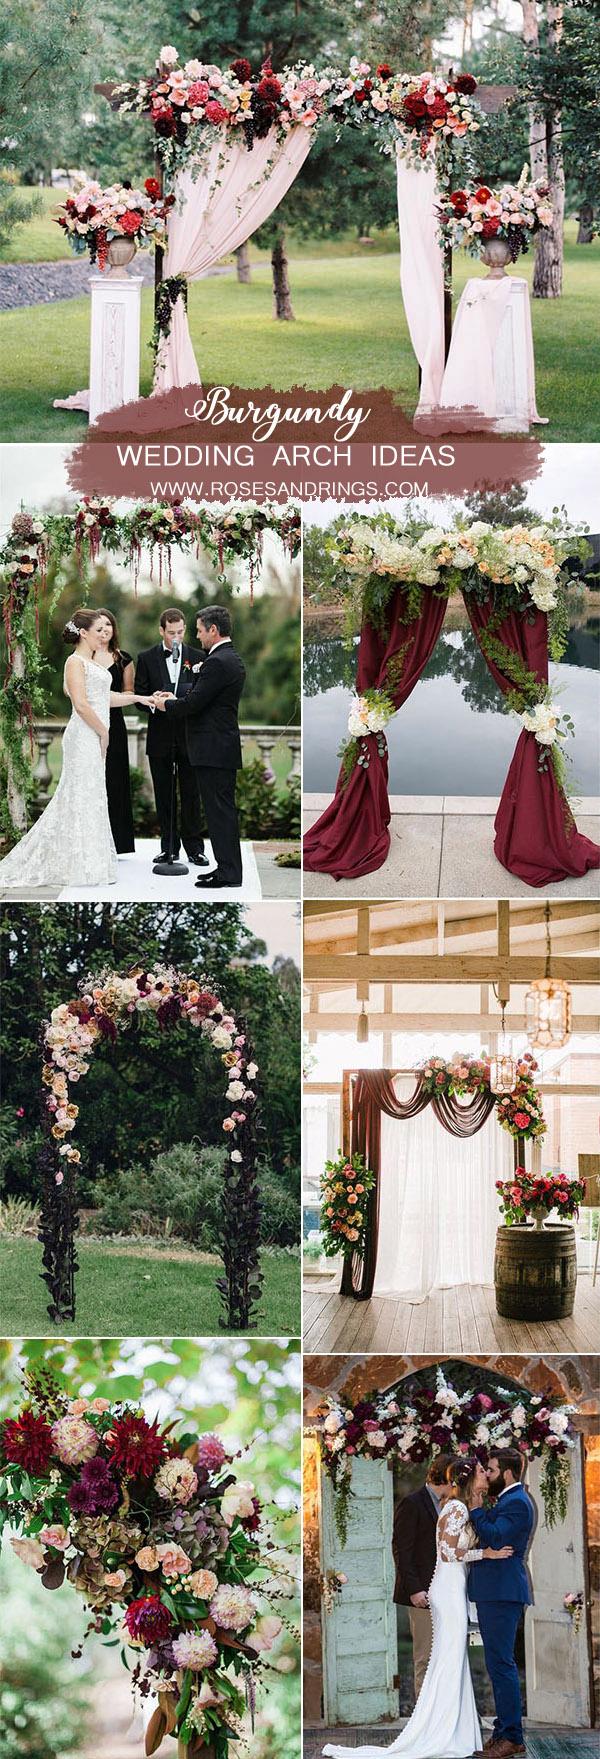 50 Best Burgundy Wedding Color Ideas for 2020 | Roses & Rings